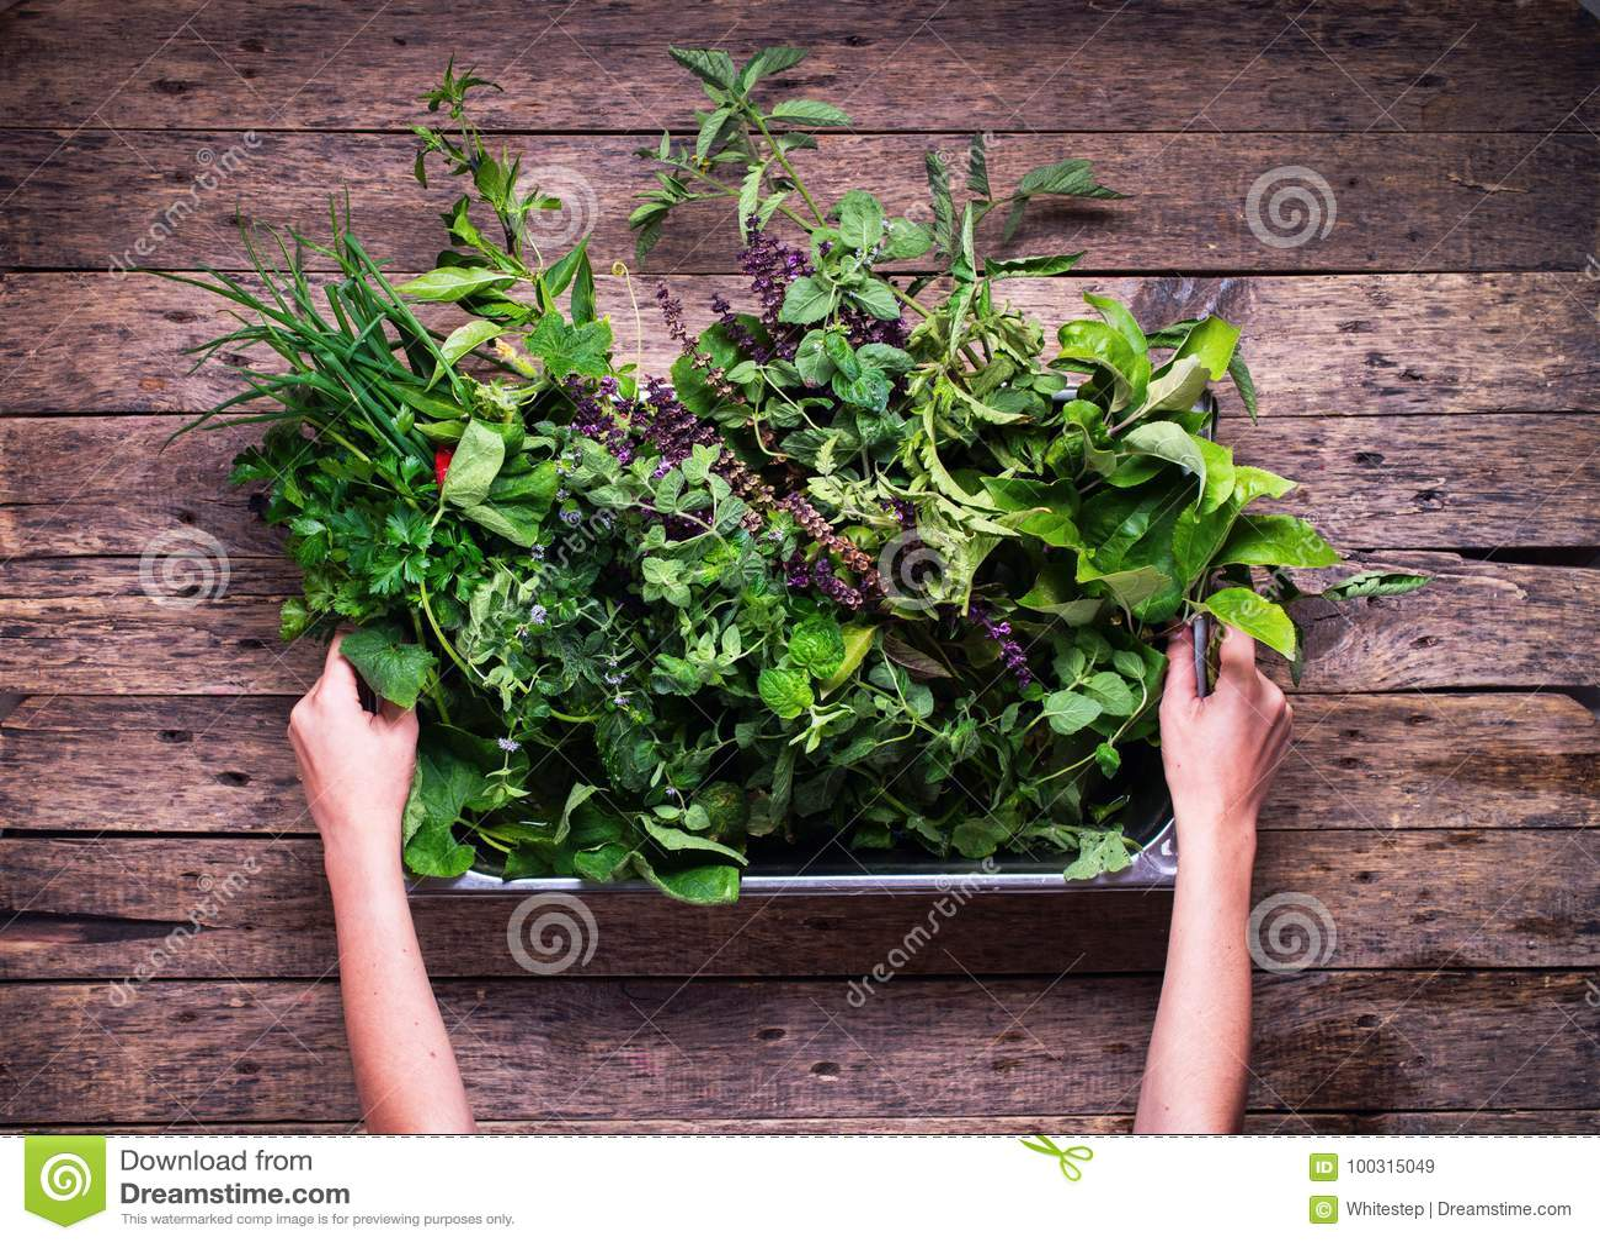 Especiaria pequena Herb Garden Rustic Wooden Table